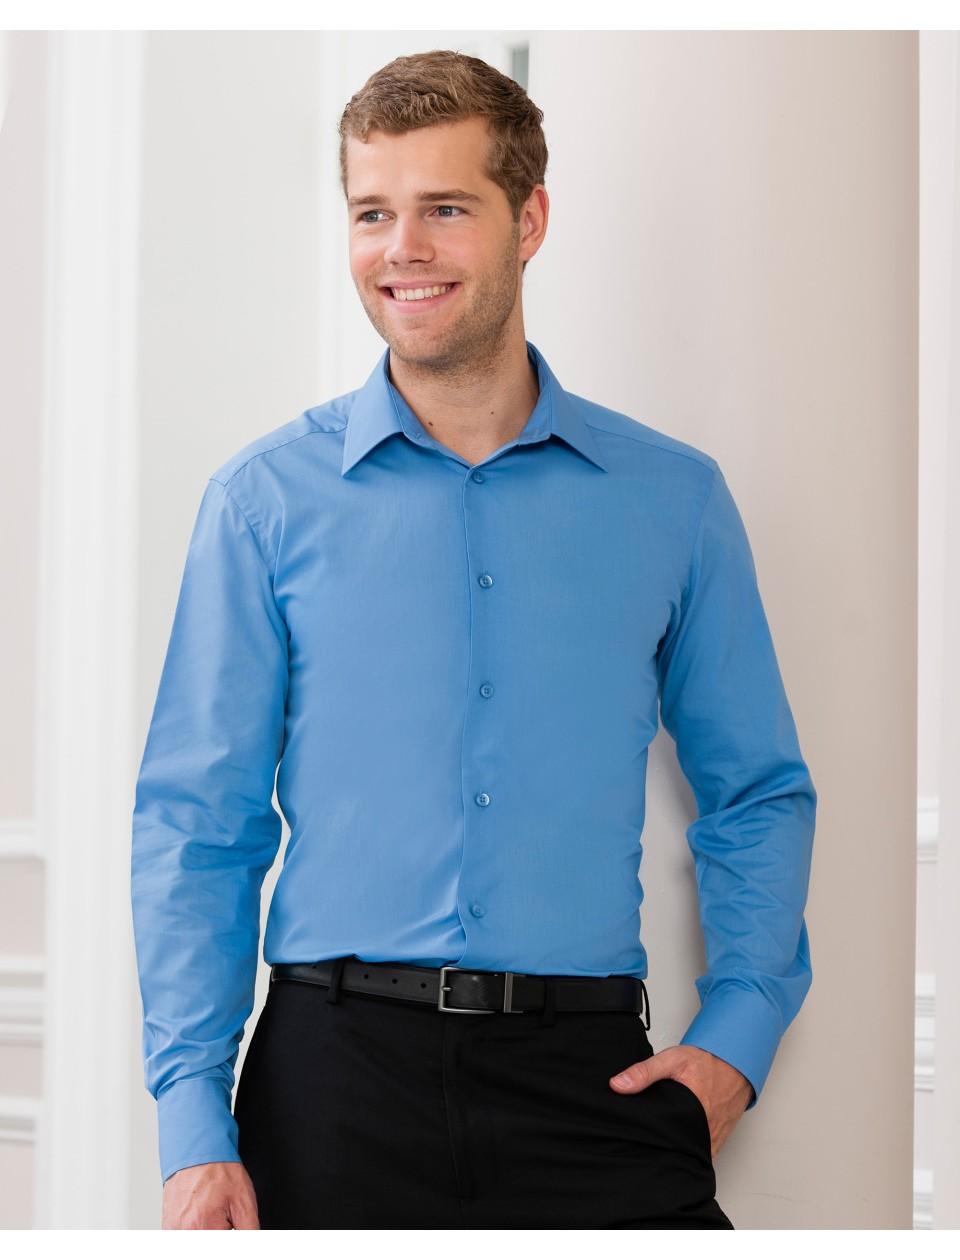 Russell collection men 39 s long sleeve polycotton poplin for Long sleeve poplin shirt